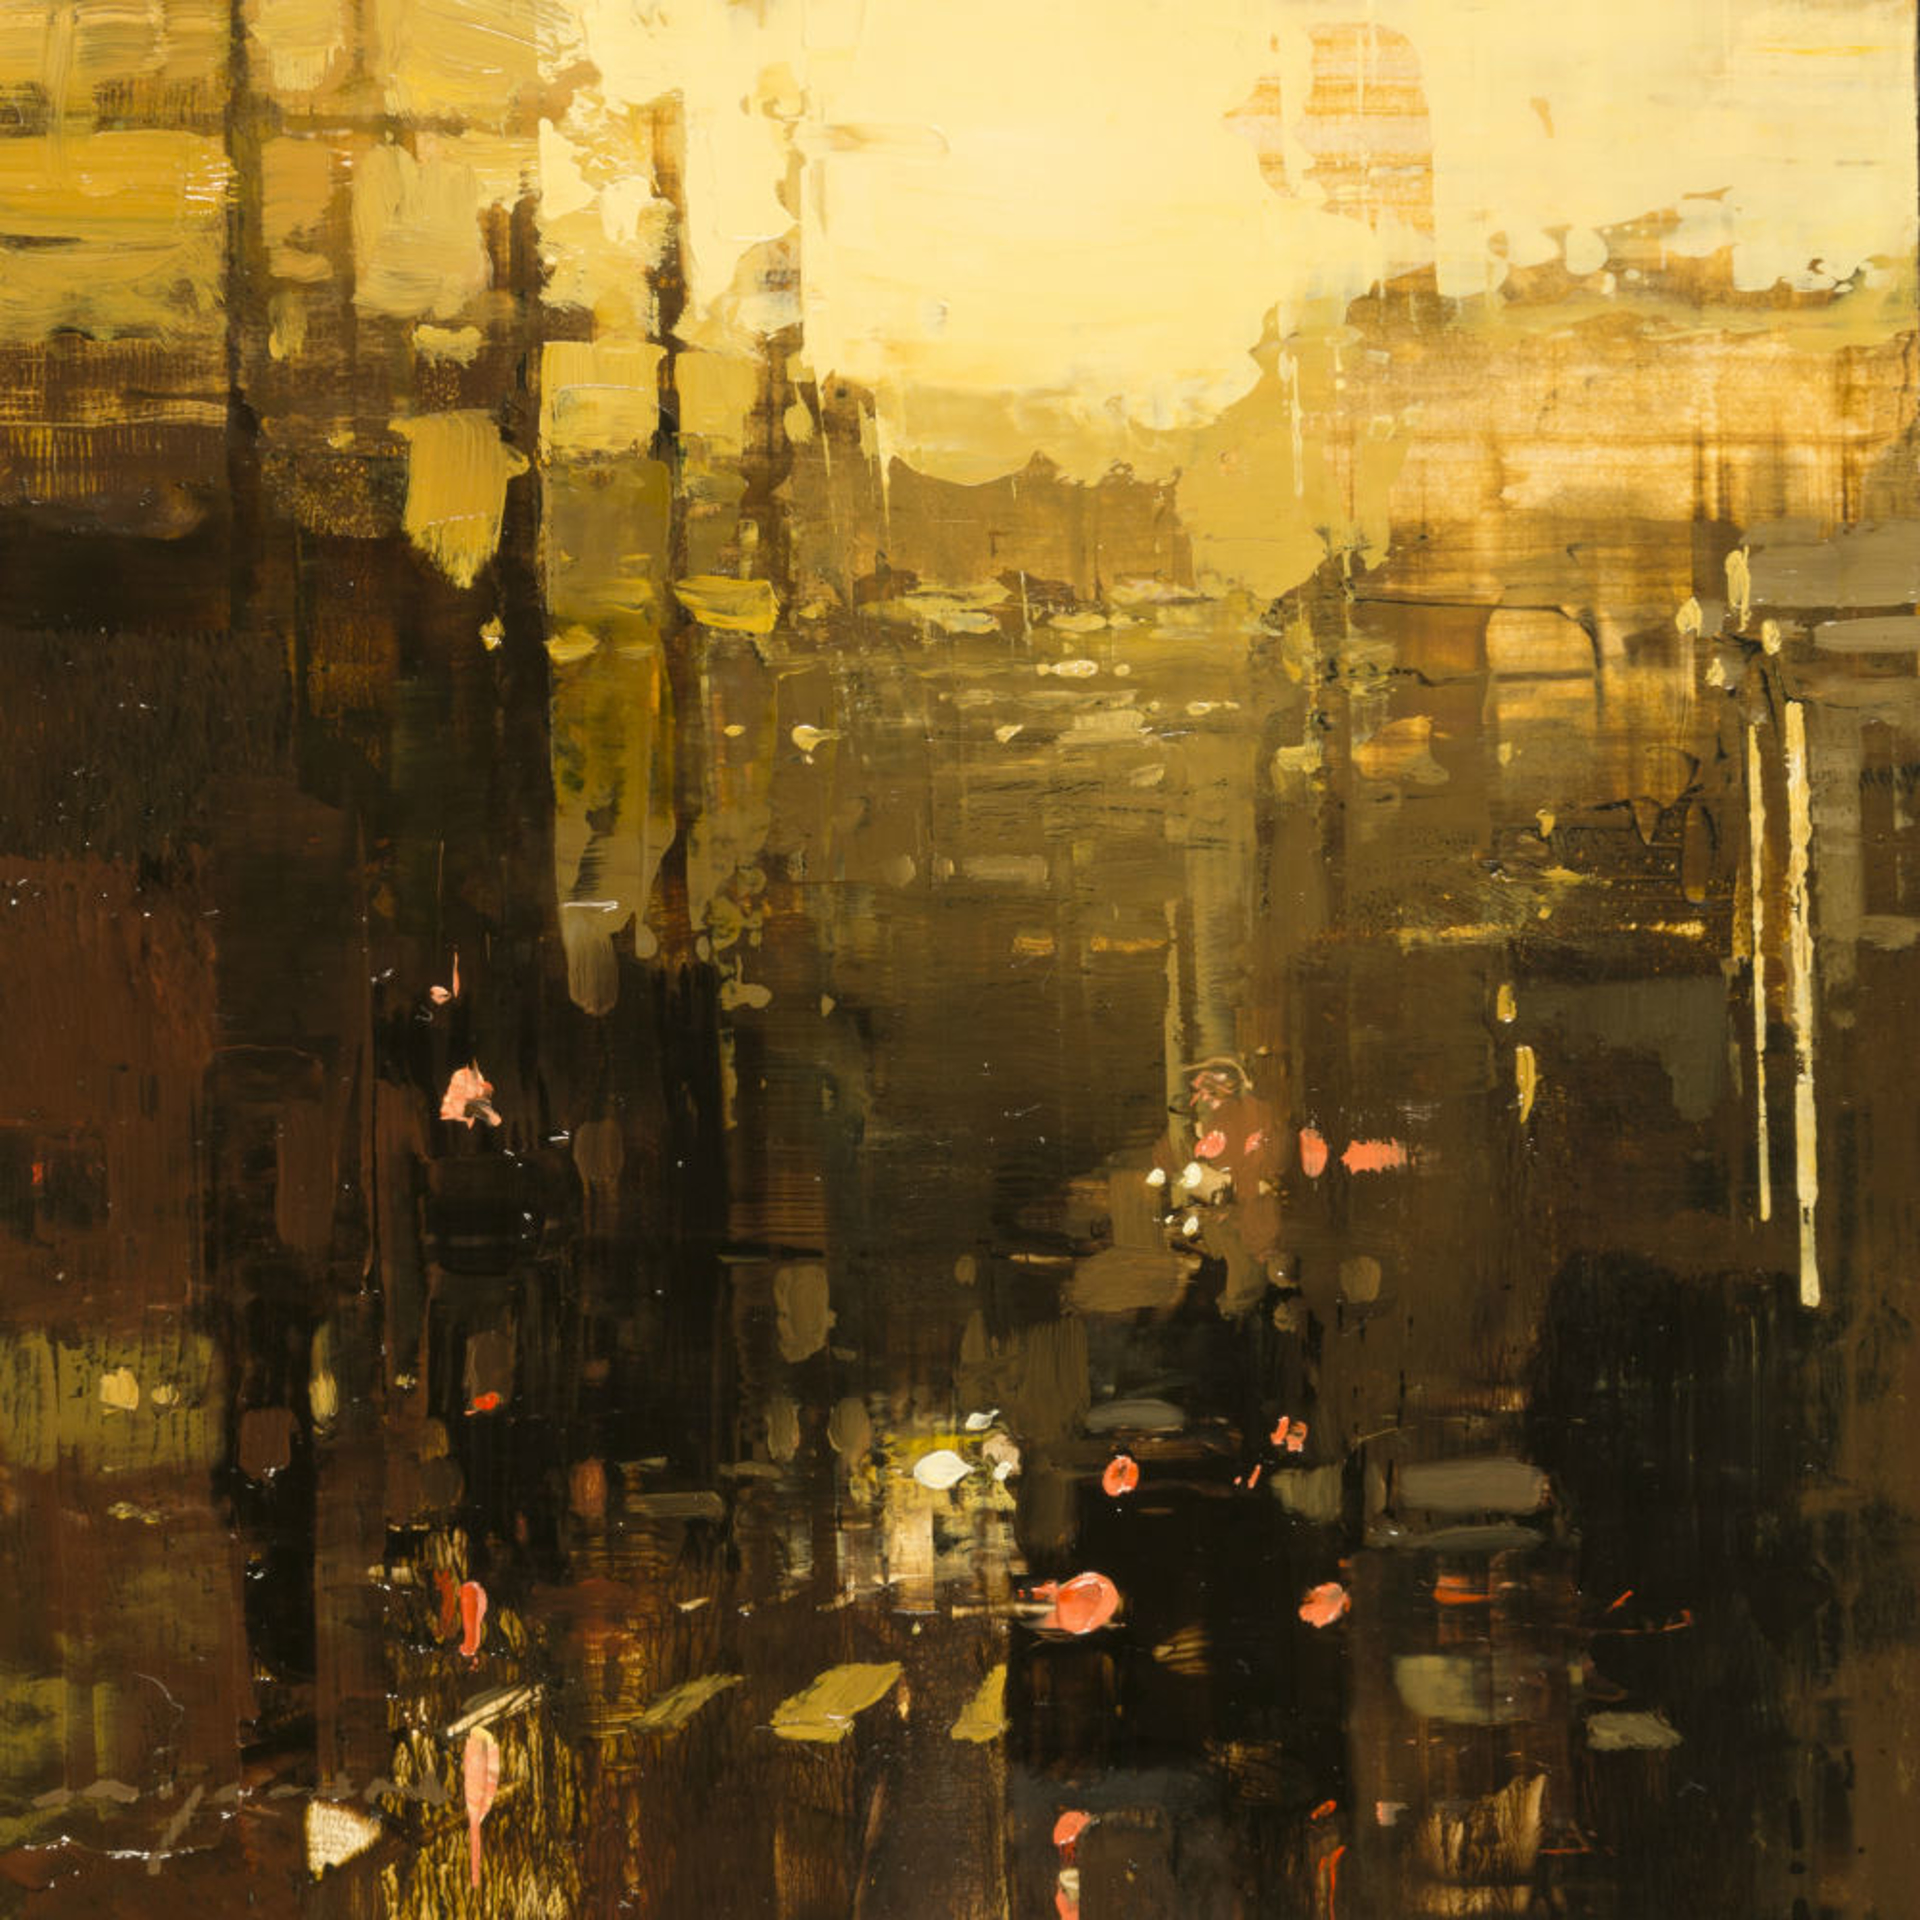 Cityscape  - Composed Form Study no. 26 by Jeremy Mann